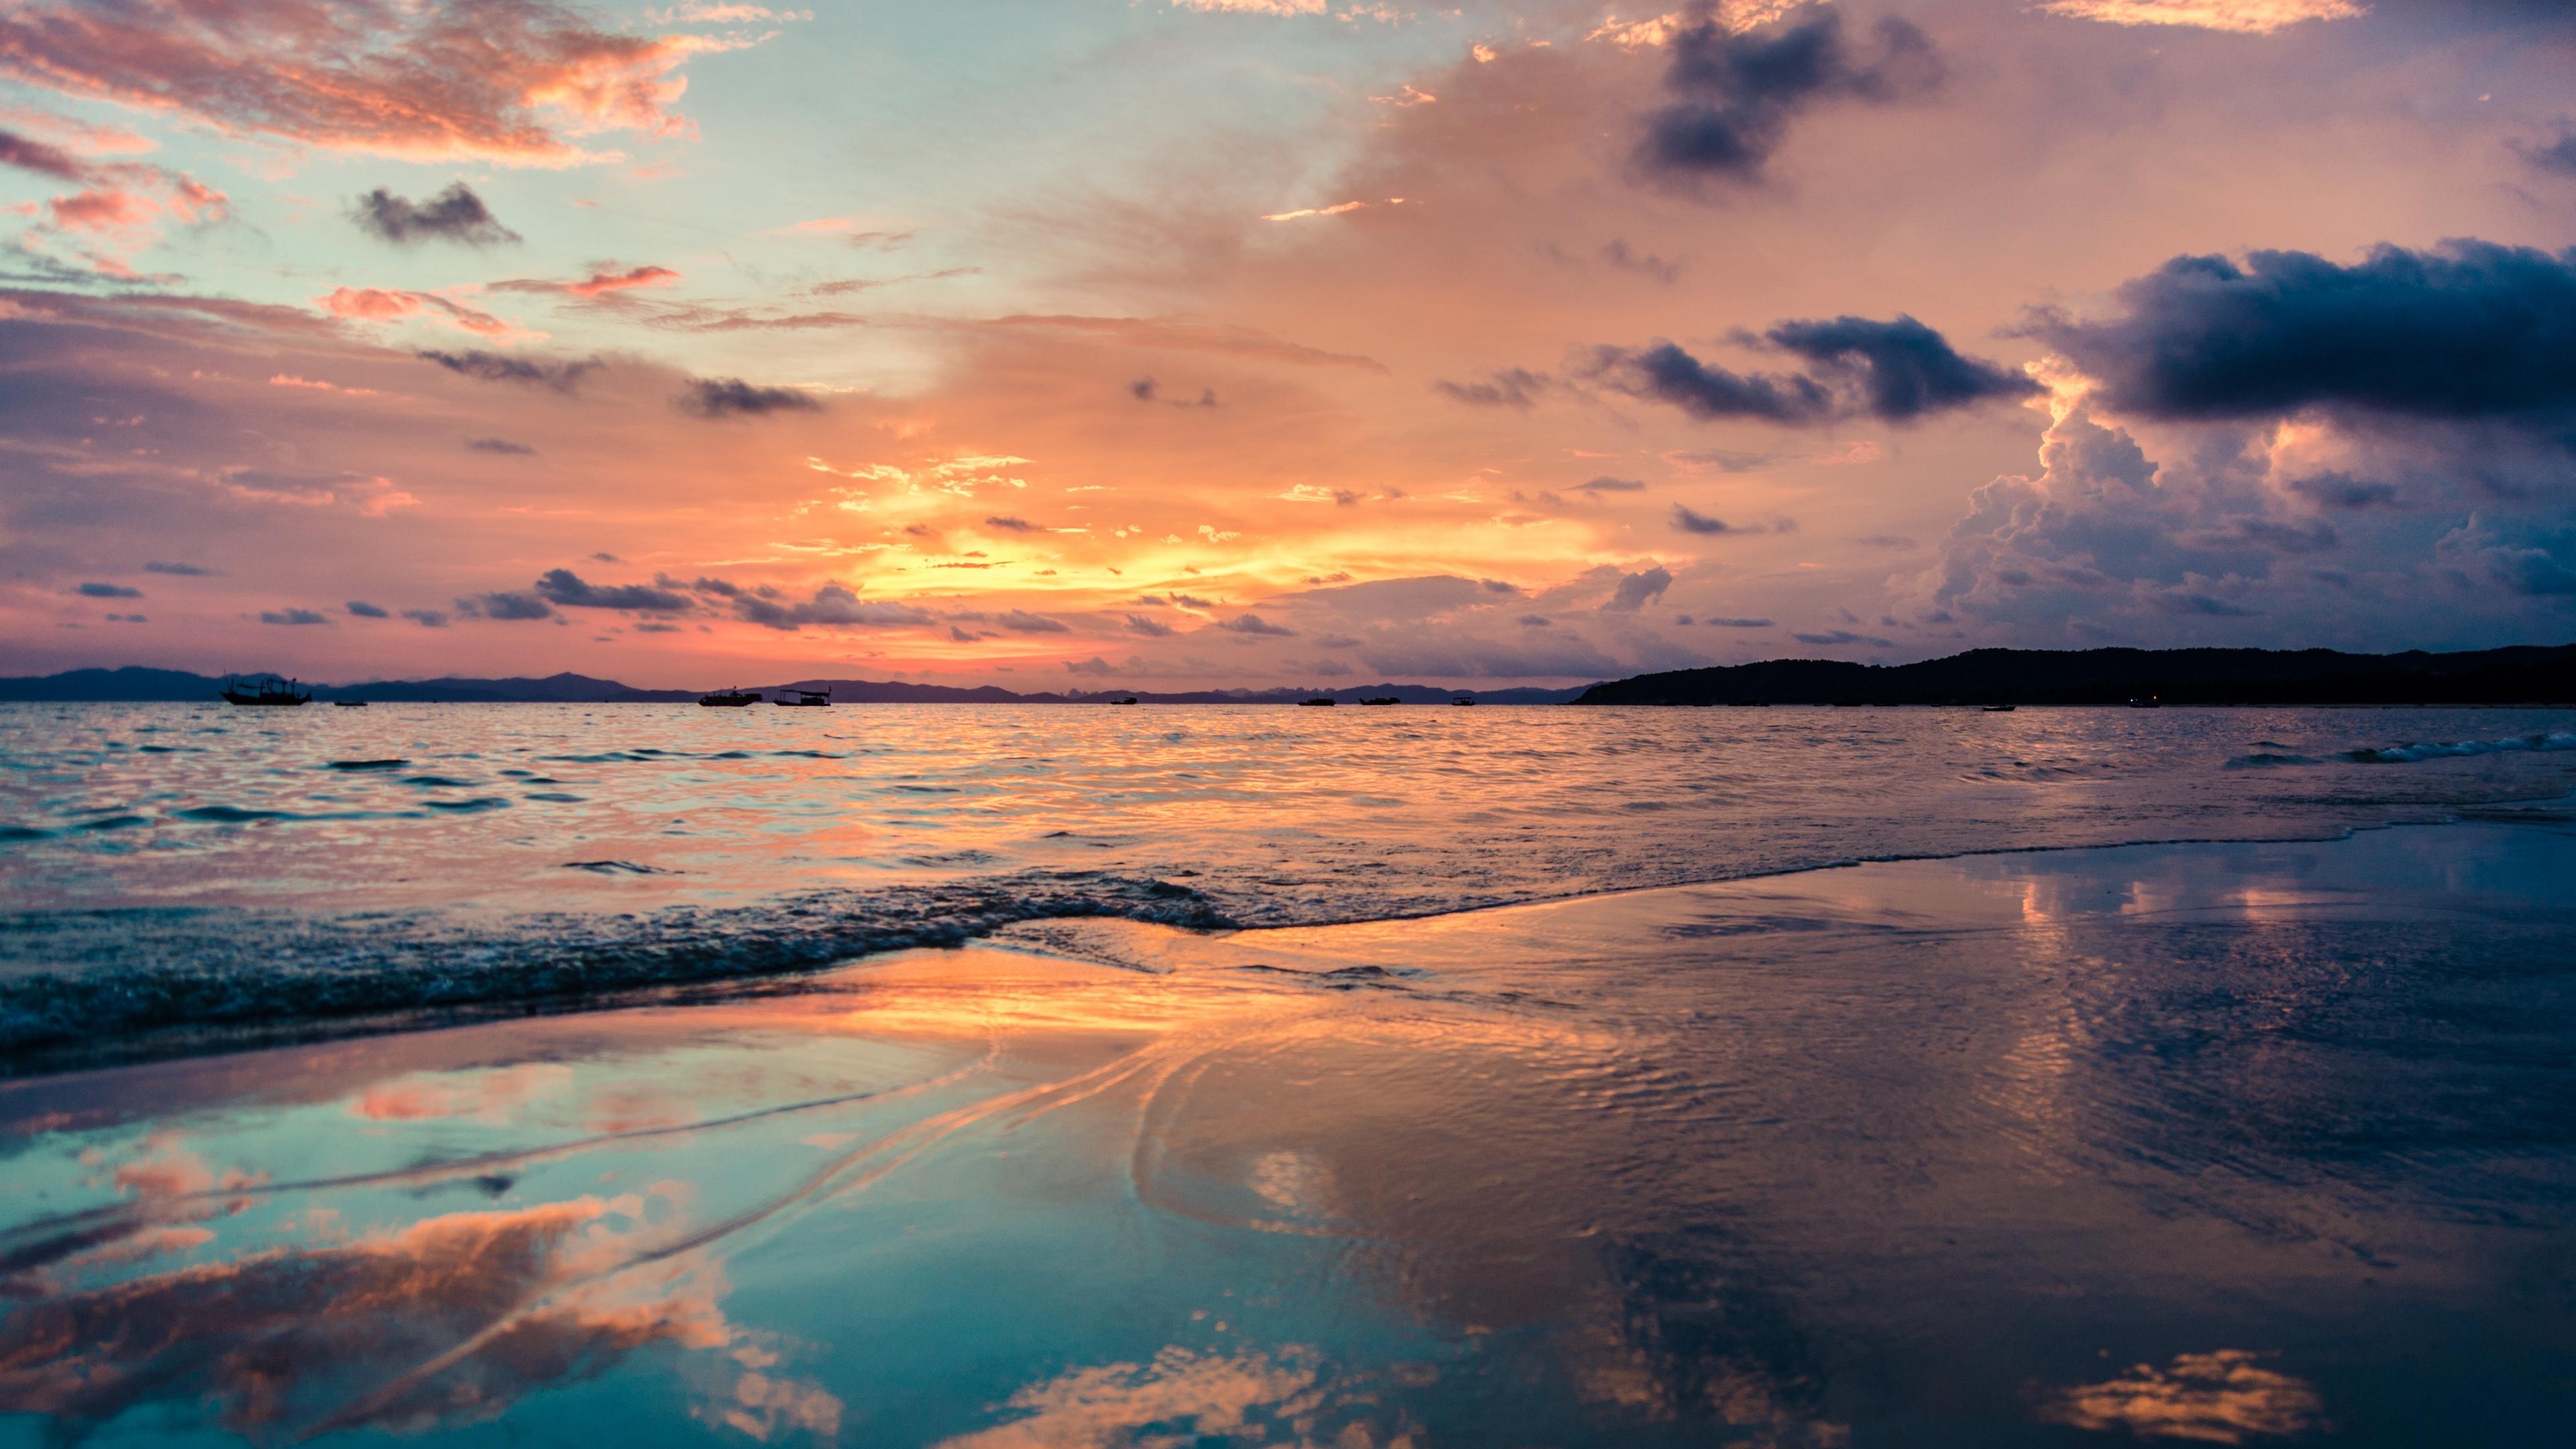 Wallpaper 4k Sea Beach Sunset 4k Beach Sea Sunset